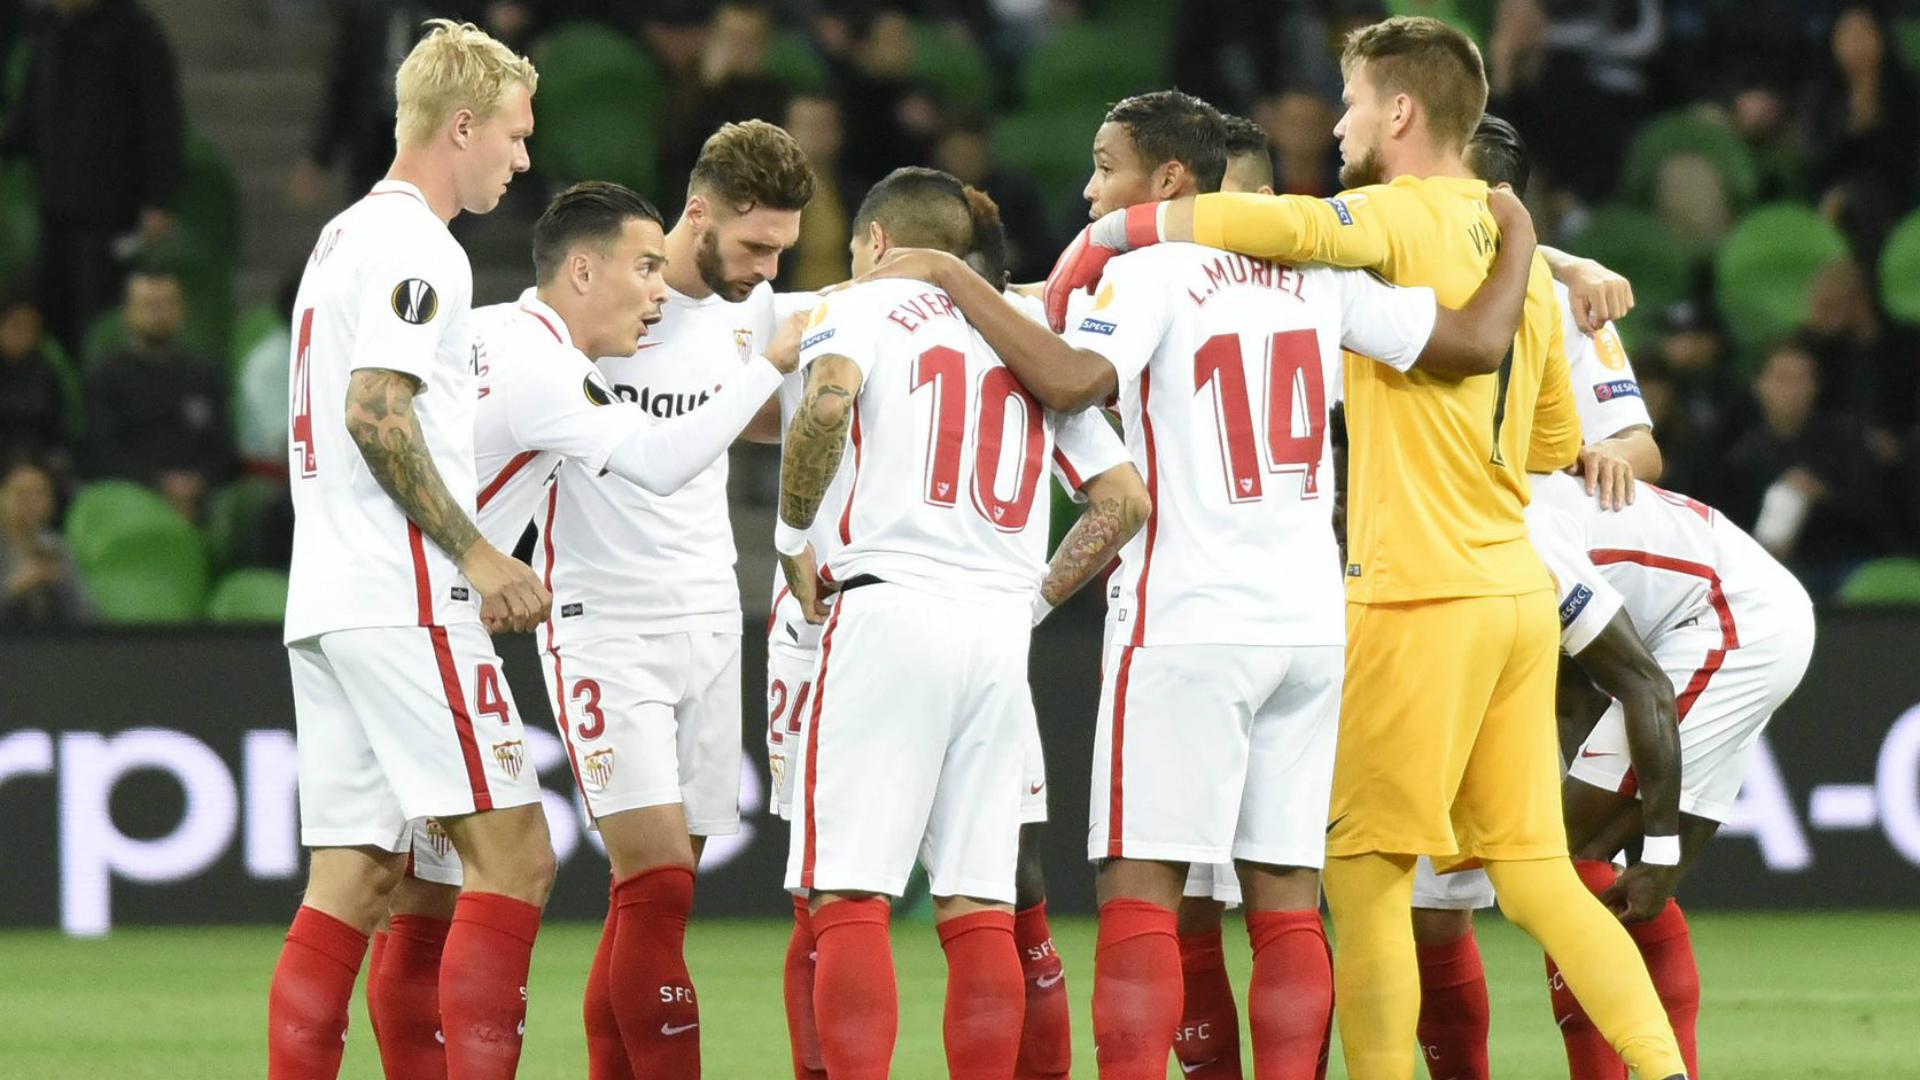 Kjaer surprised by LaLiga-leading Sevilla as Machin's men remain grounded